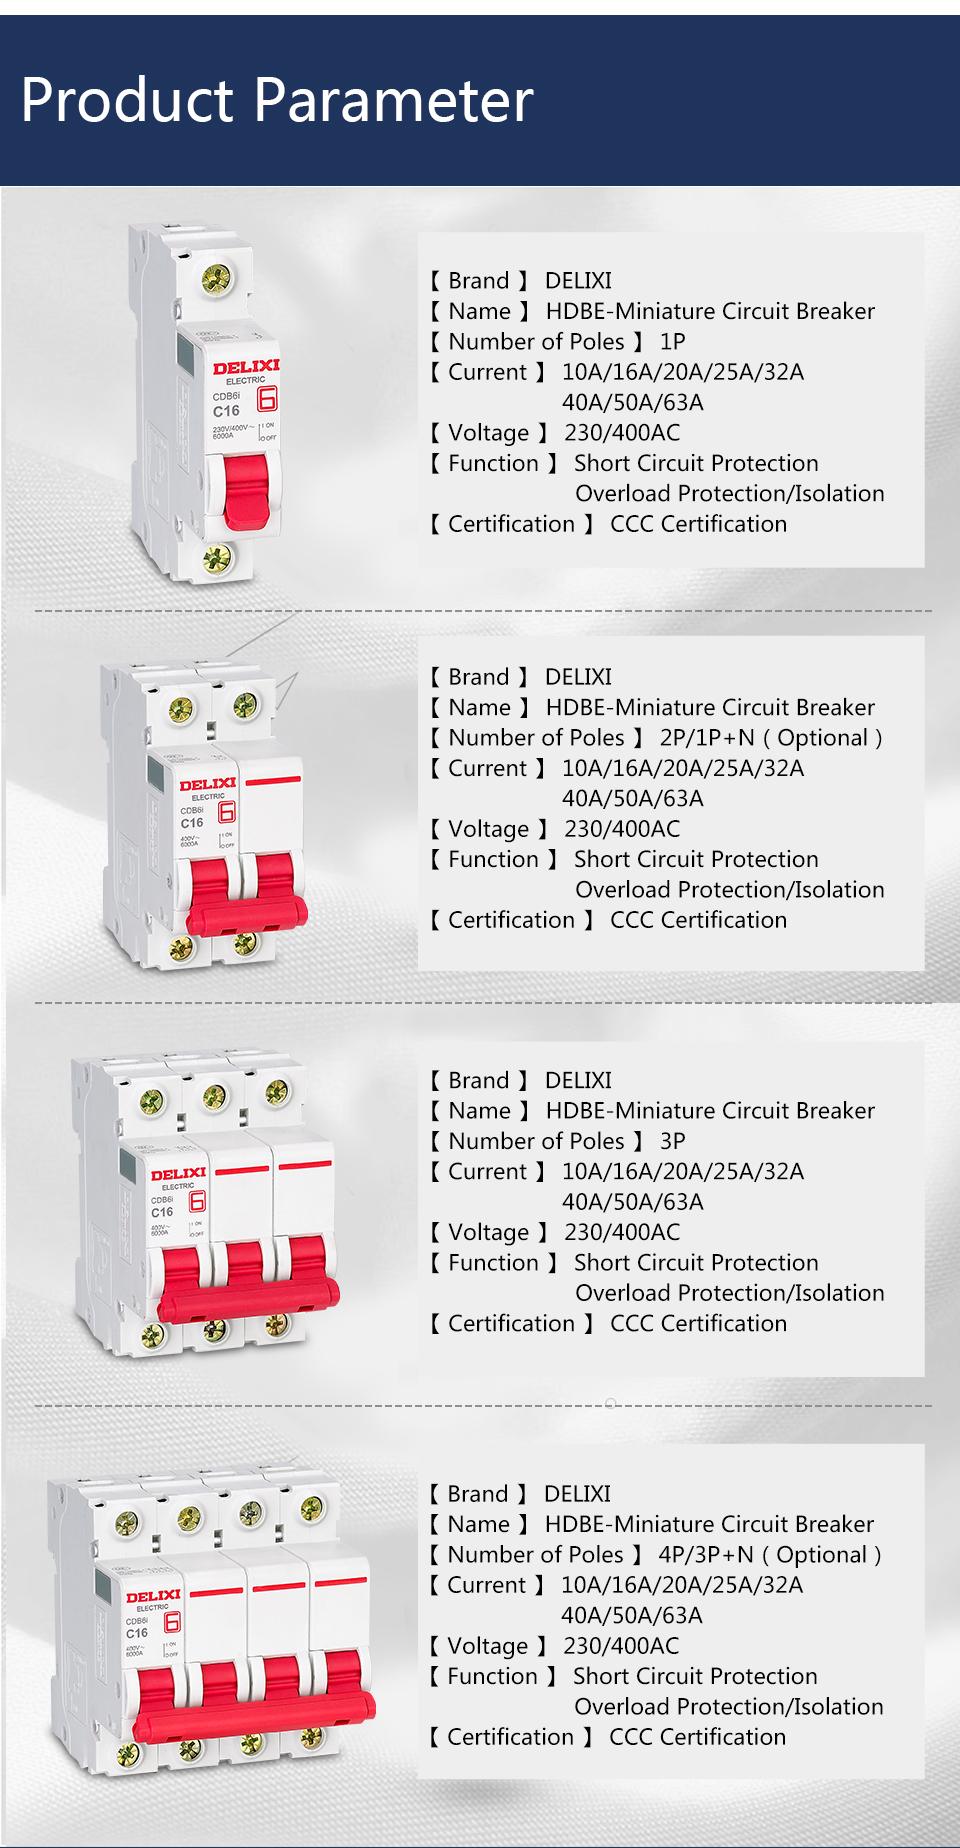 Delixi Cdb6i Ac 400v 10a 4p British Or European Standard Power Circuit  Breaker Remote Control Circuit Breaker - Buy Remote Control Circuit